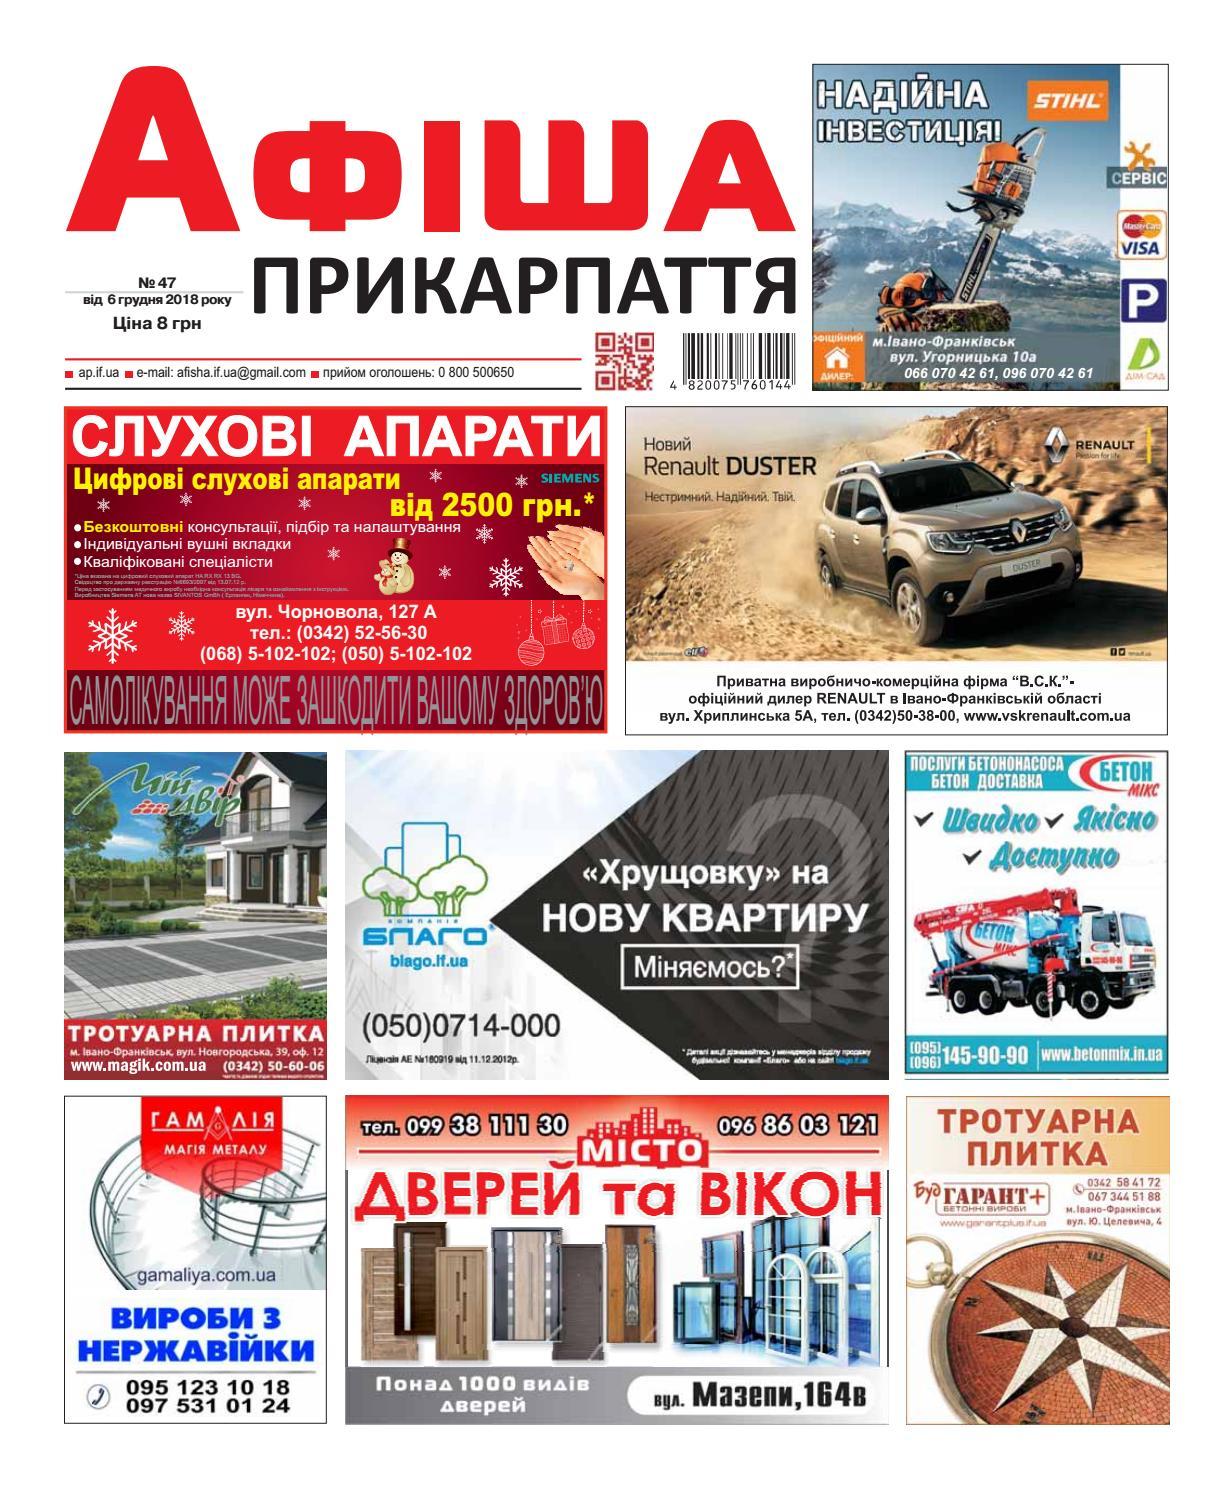 Афіша Прикарпаття № 47 by Olya Olya - issuu 149a24ec2c42e